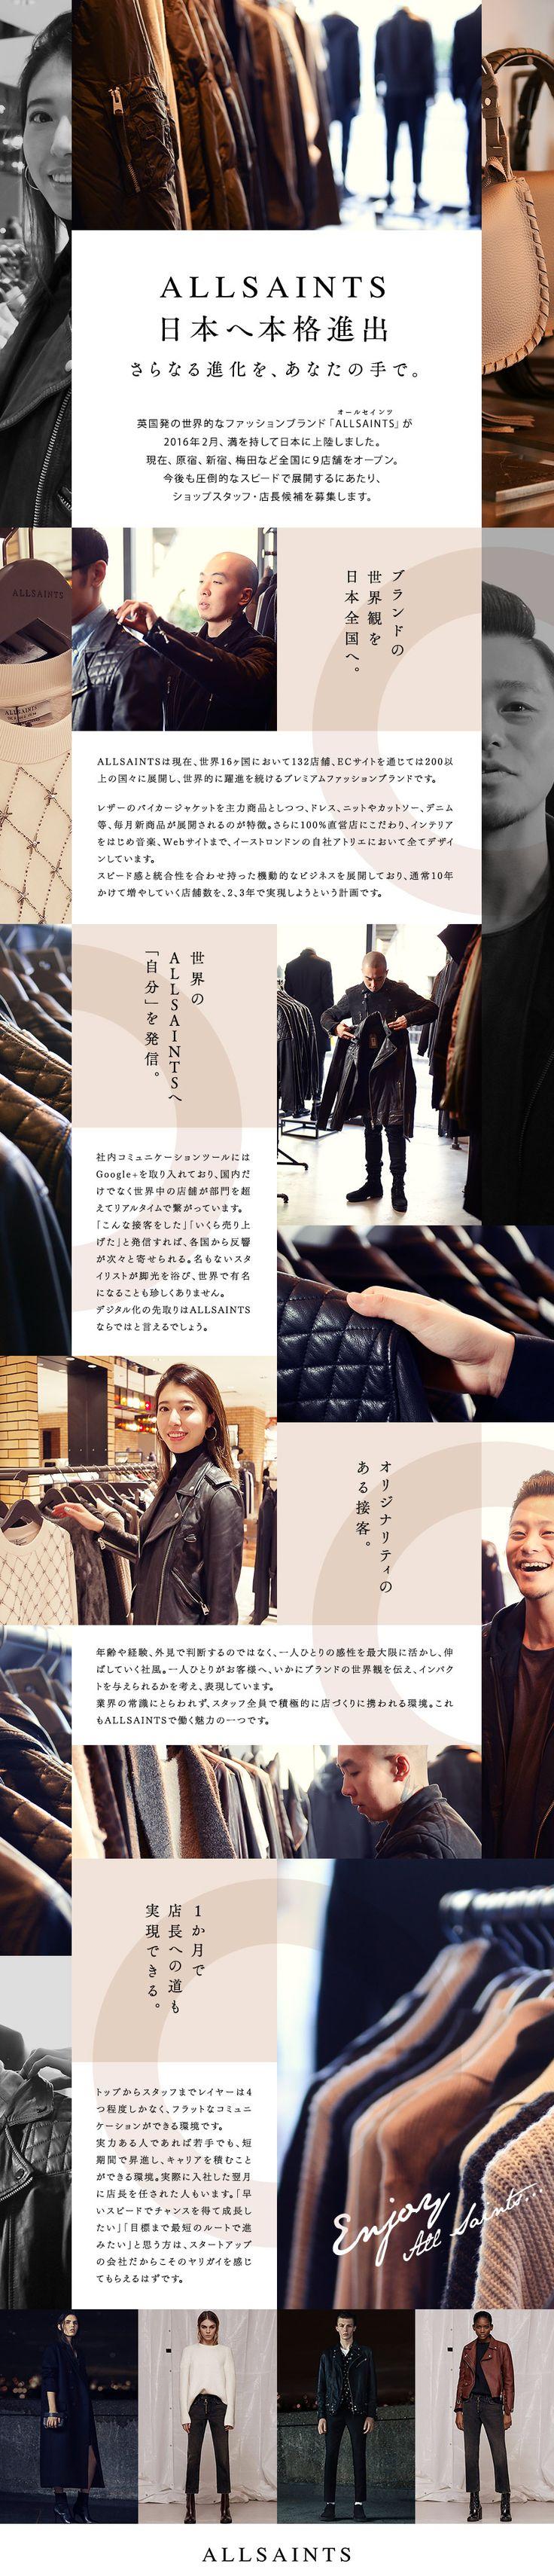 ALLSAINTS JAPAN株式会社/ショップスタッフ/店長候補(2016年日本初上陸、今後店舗拡大していきます/海外研修あり)の求人PR - 転職ならDODA(デューダ)